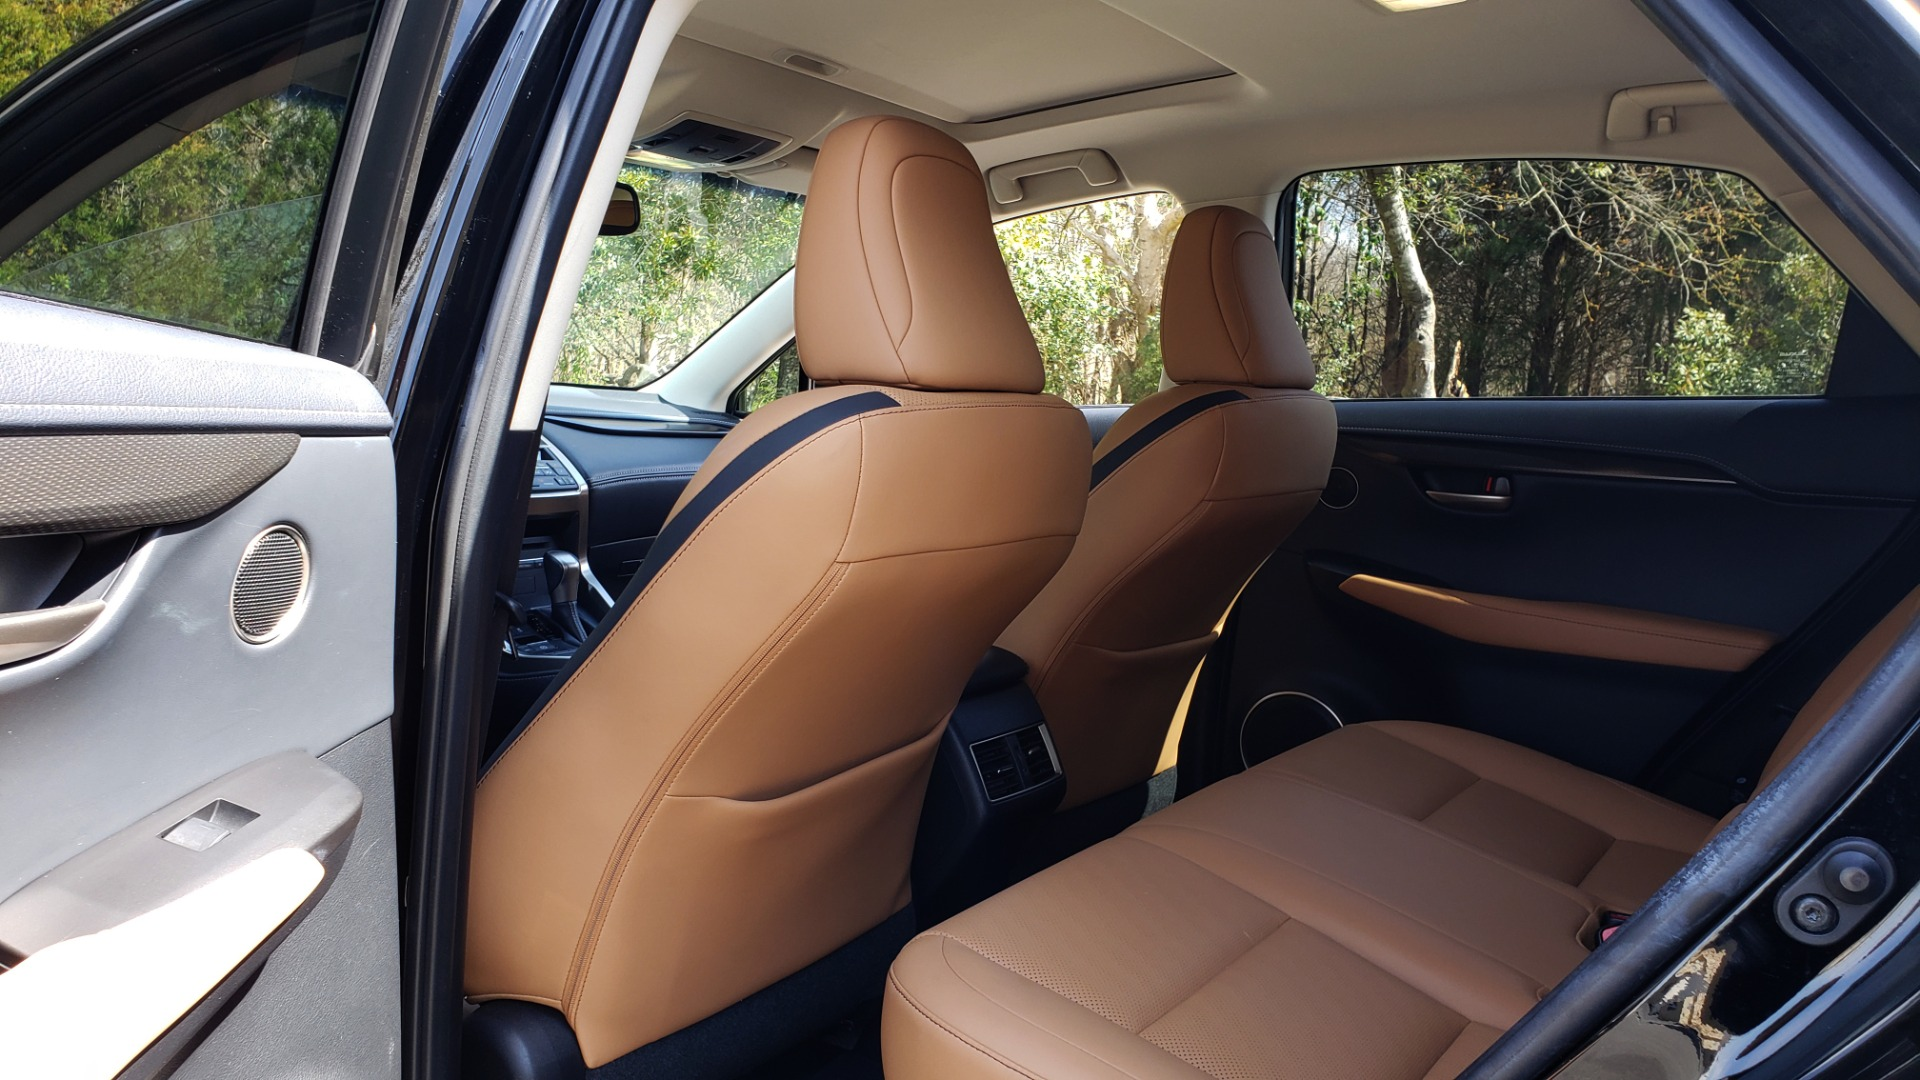 Used 2016 Lexus NX 200T PREM PKG / NAV / SUNROOF / PRE-COLLISION / PARK ASST for sale Sold at Formula Imports in Charlotte NC 28227 59